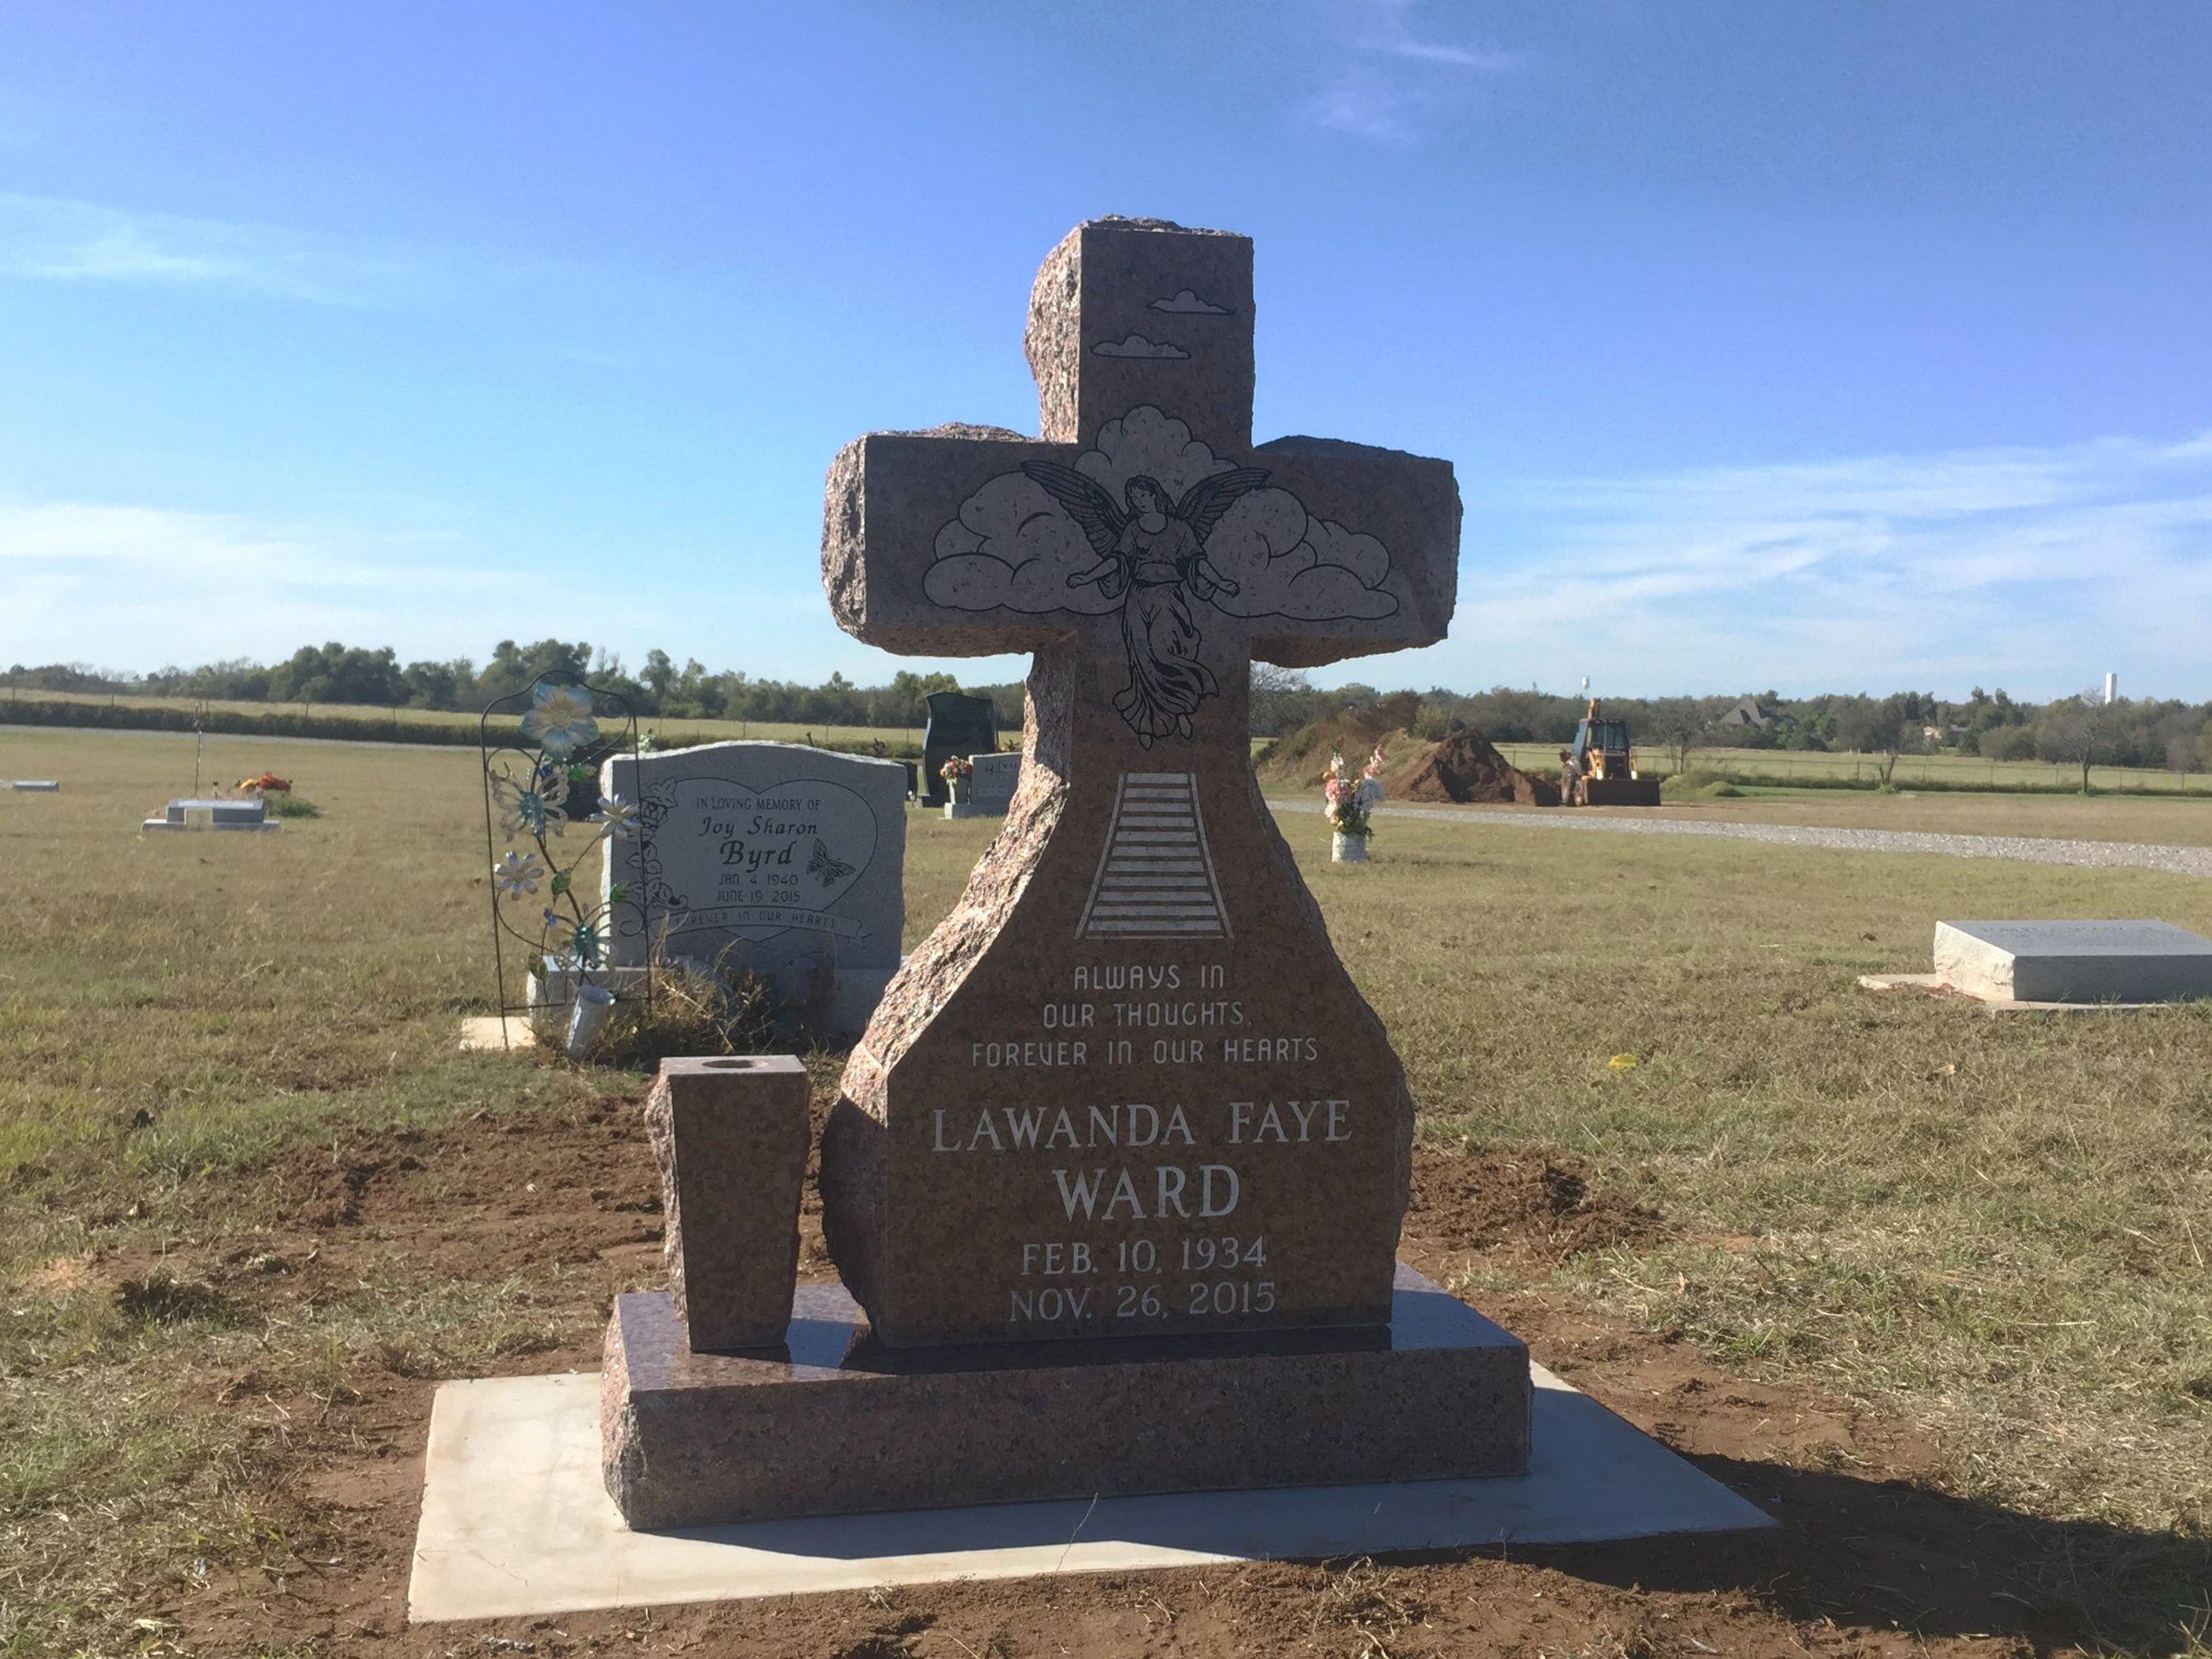 57. Fairview Cemetery, Tuttle